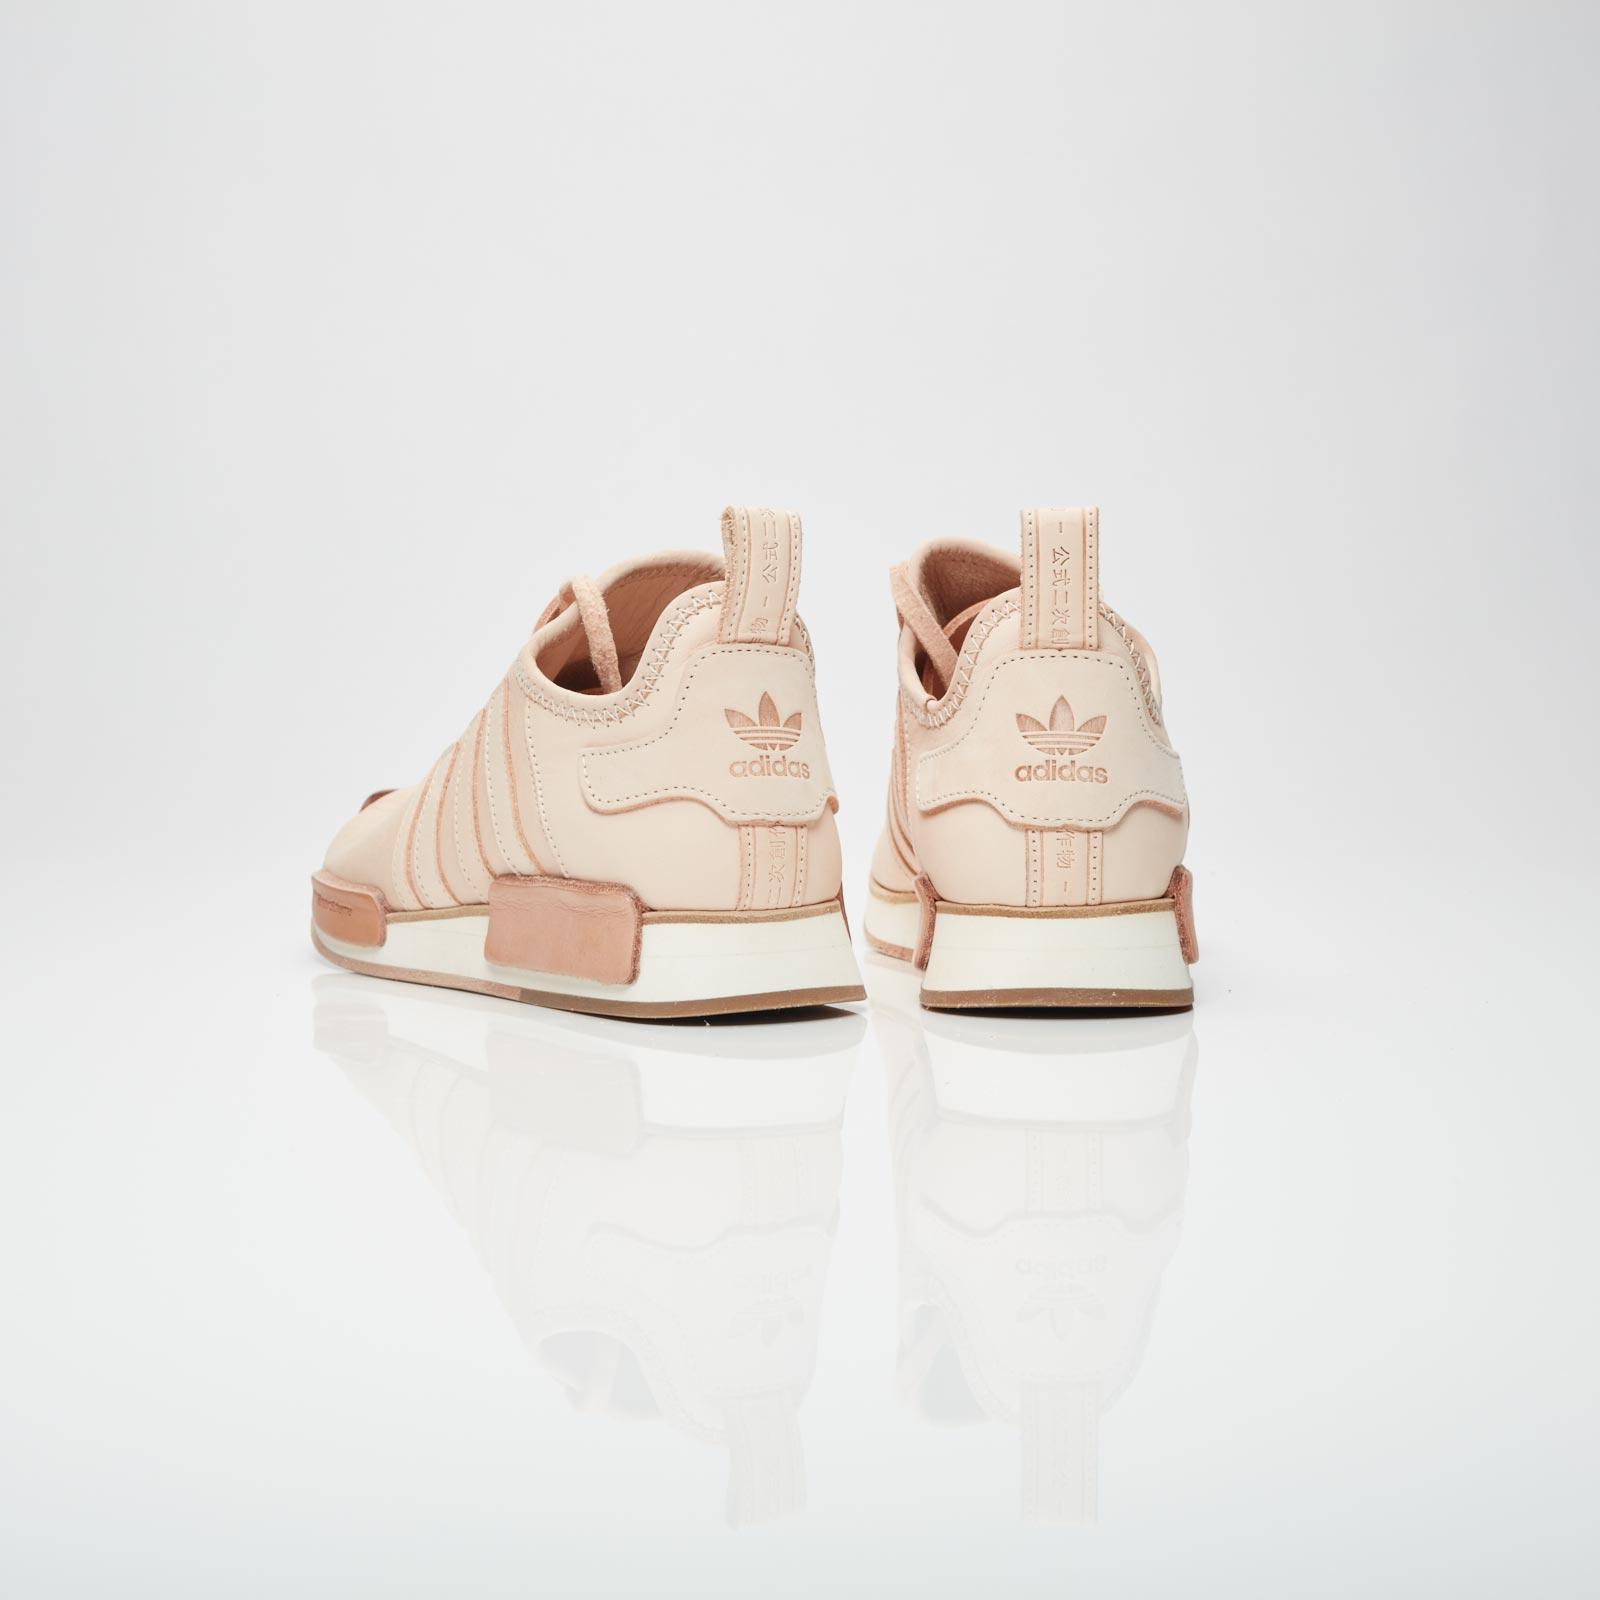 5c2b03fad1ea4 adidas NMD R1 Hender Scheme - Ci9814 - Sneakersnstuff